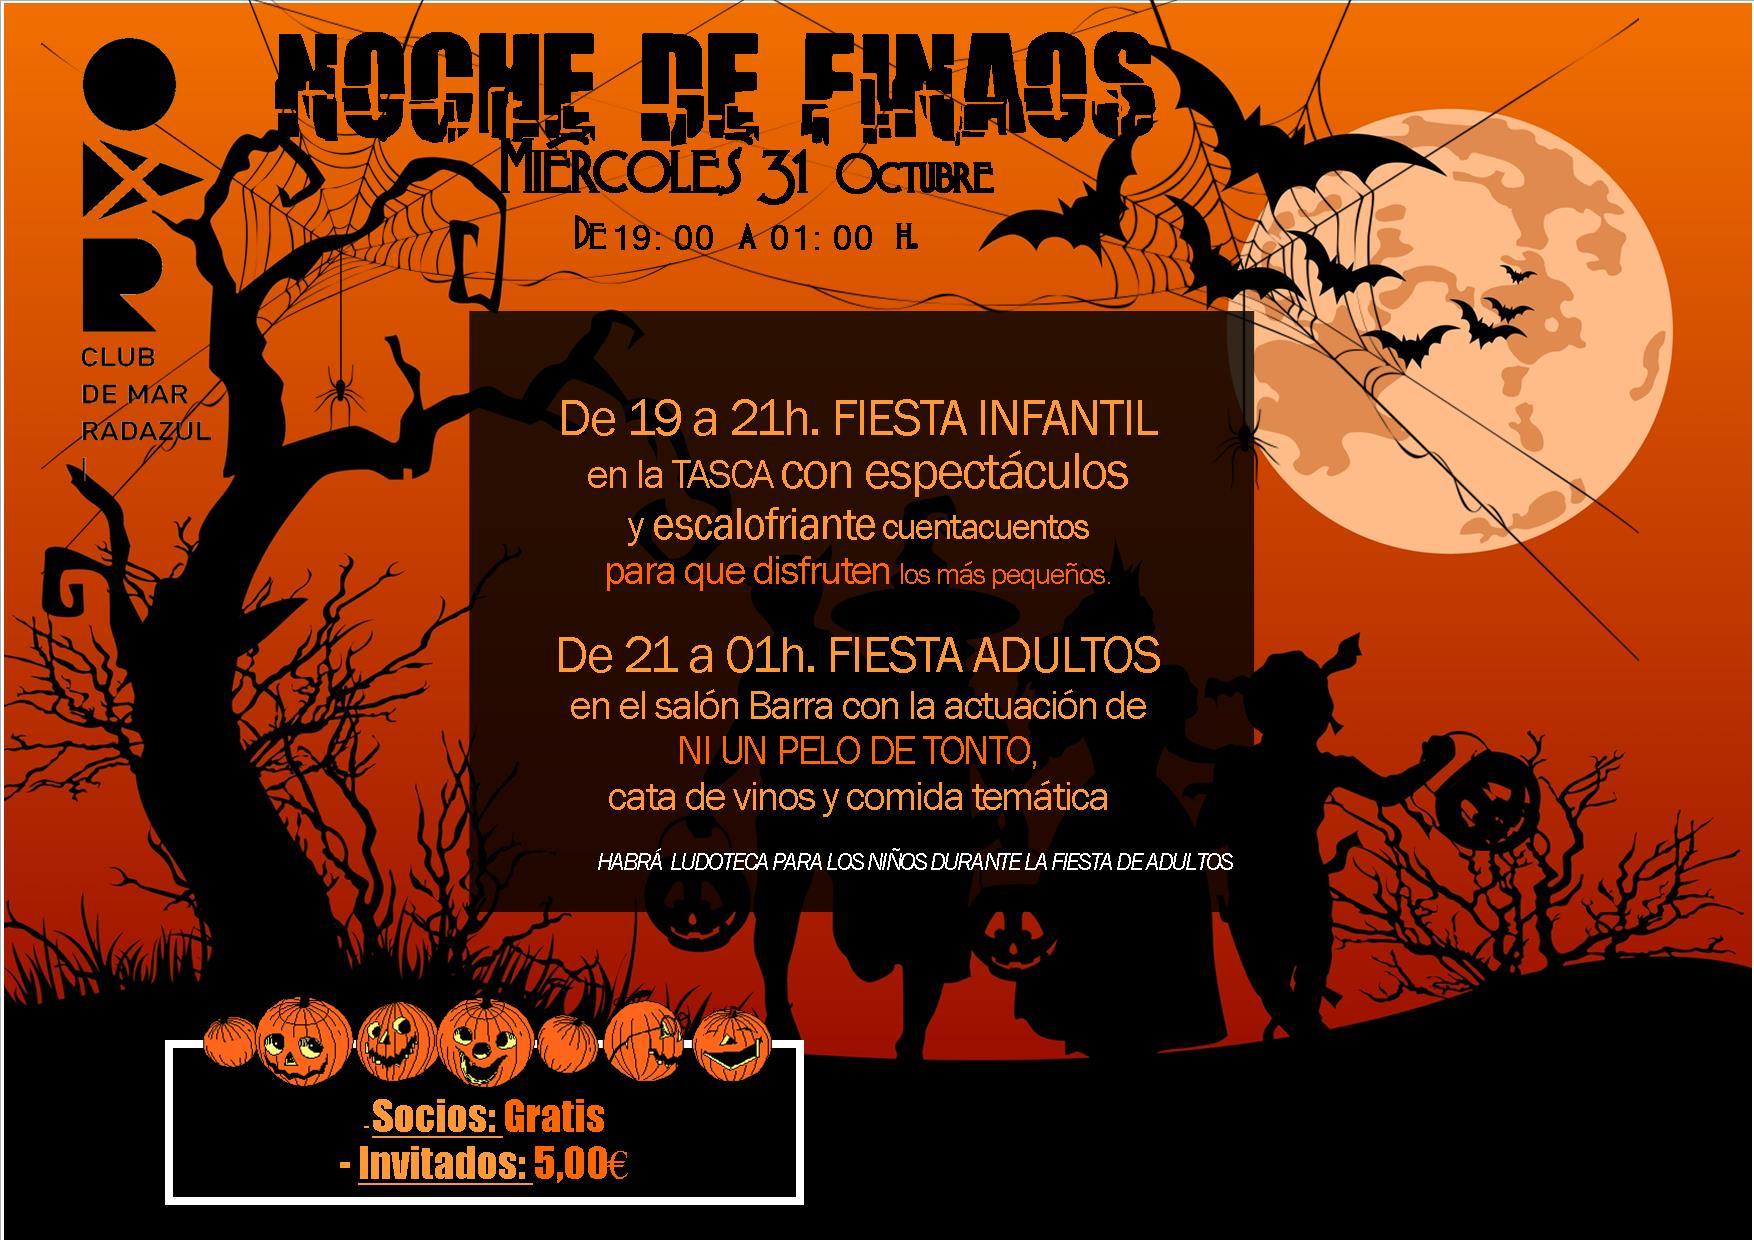 2018 10 NOCHE DE FINAOS FIESTA HALLOWEEN